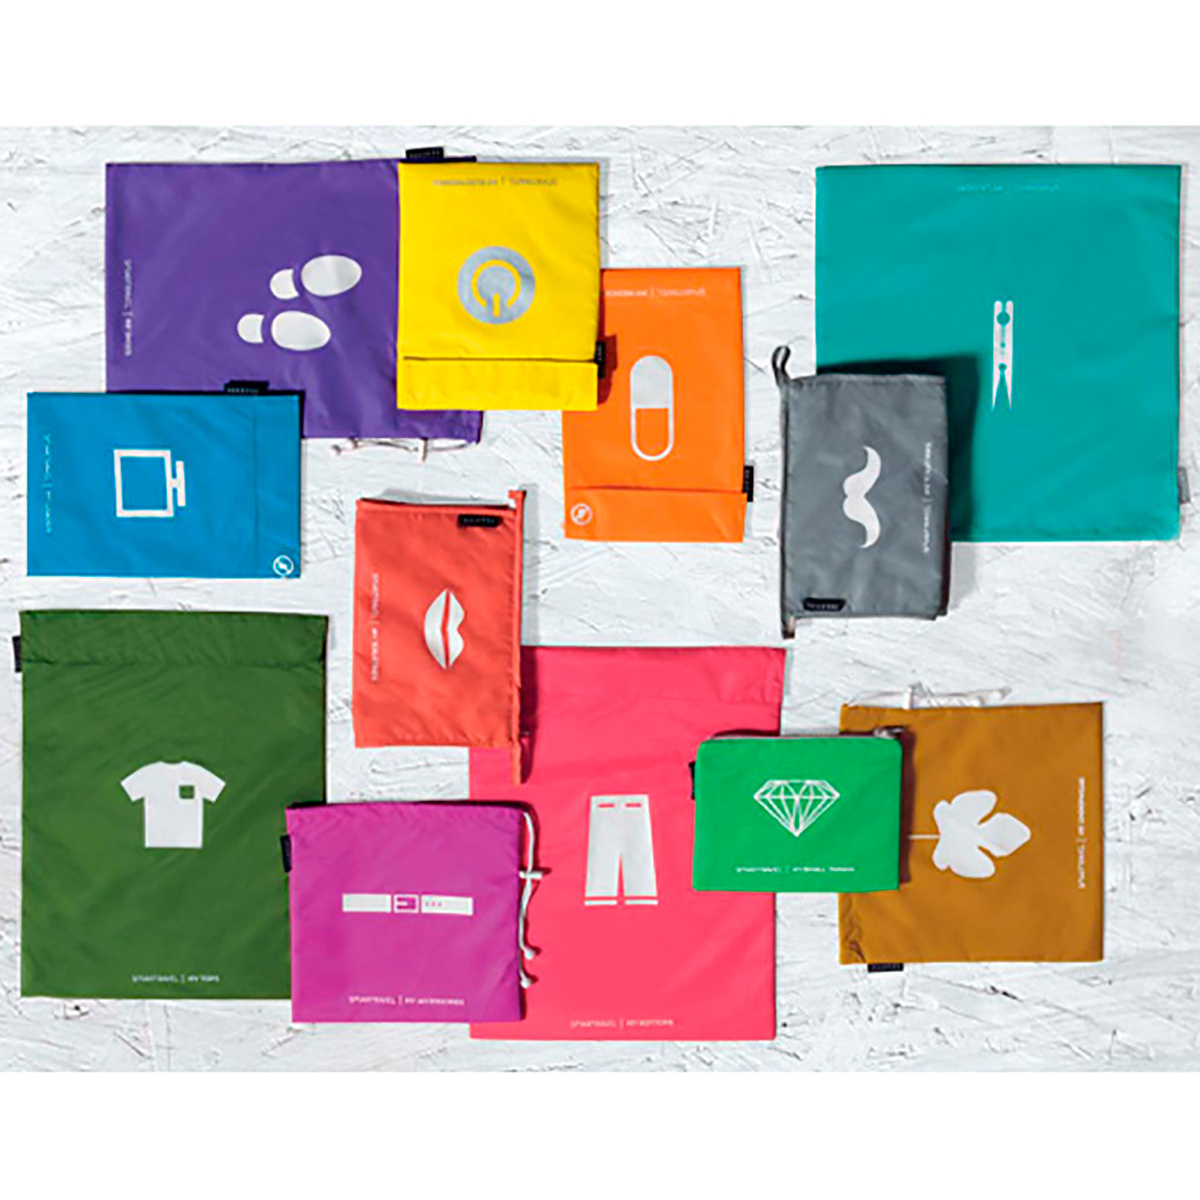 Smartravel my medicines travel bag by seletti lovethesign for Smart travel seletti